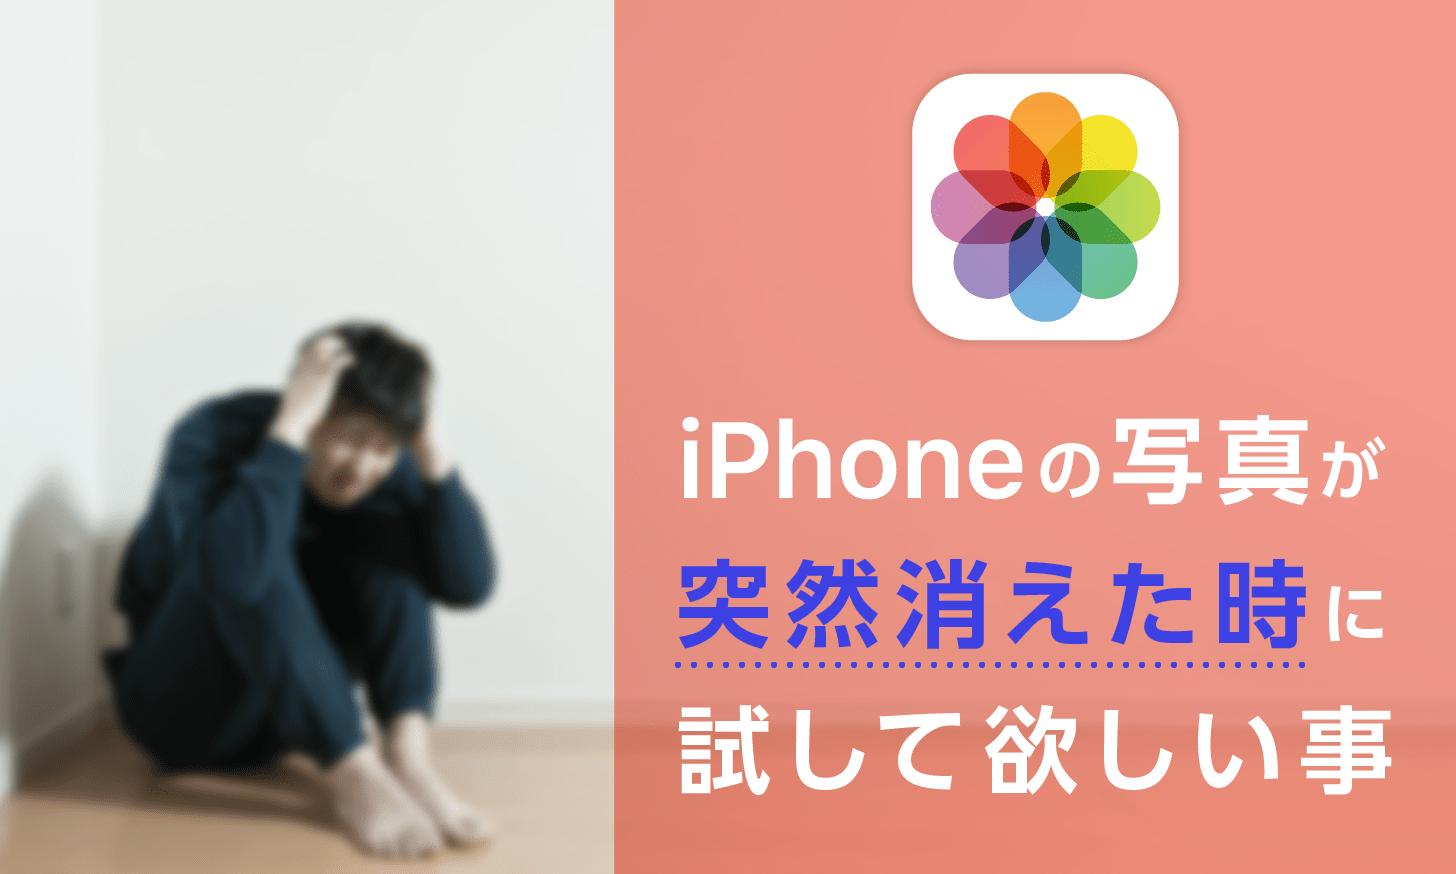 iPhoneの写真が突然消えた時に試して欲しい事